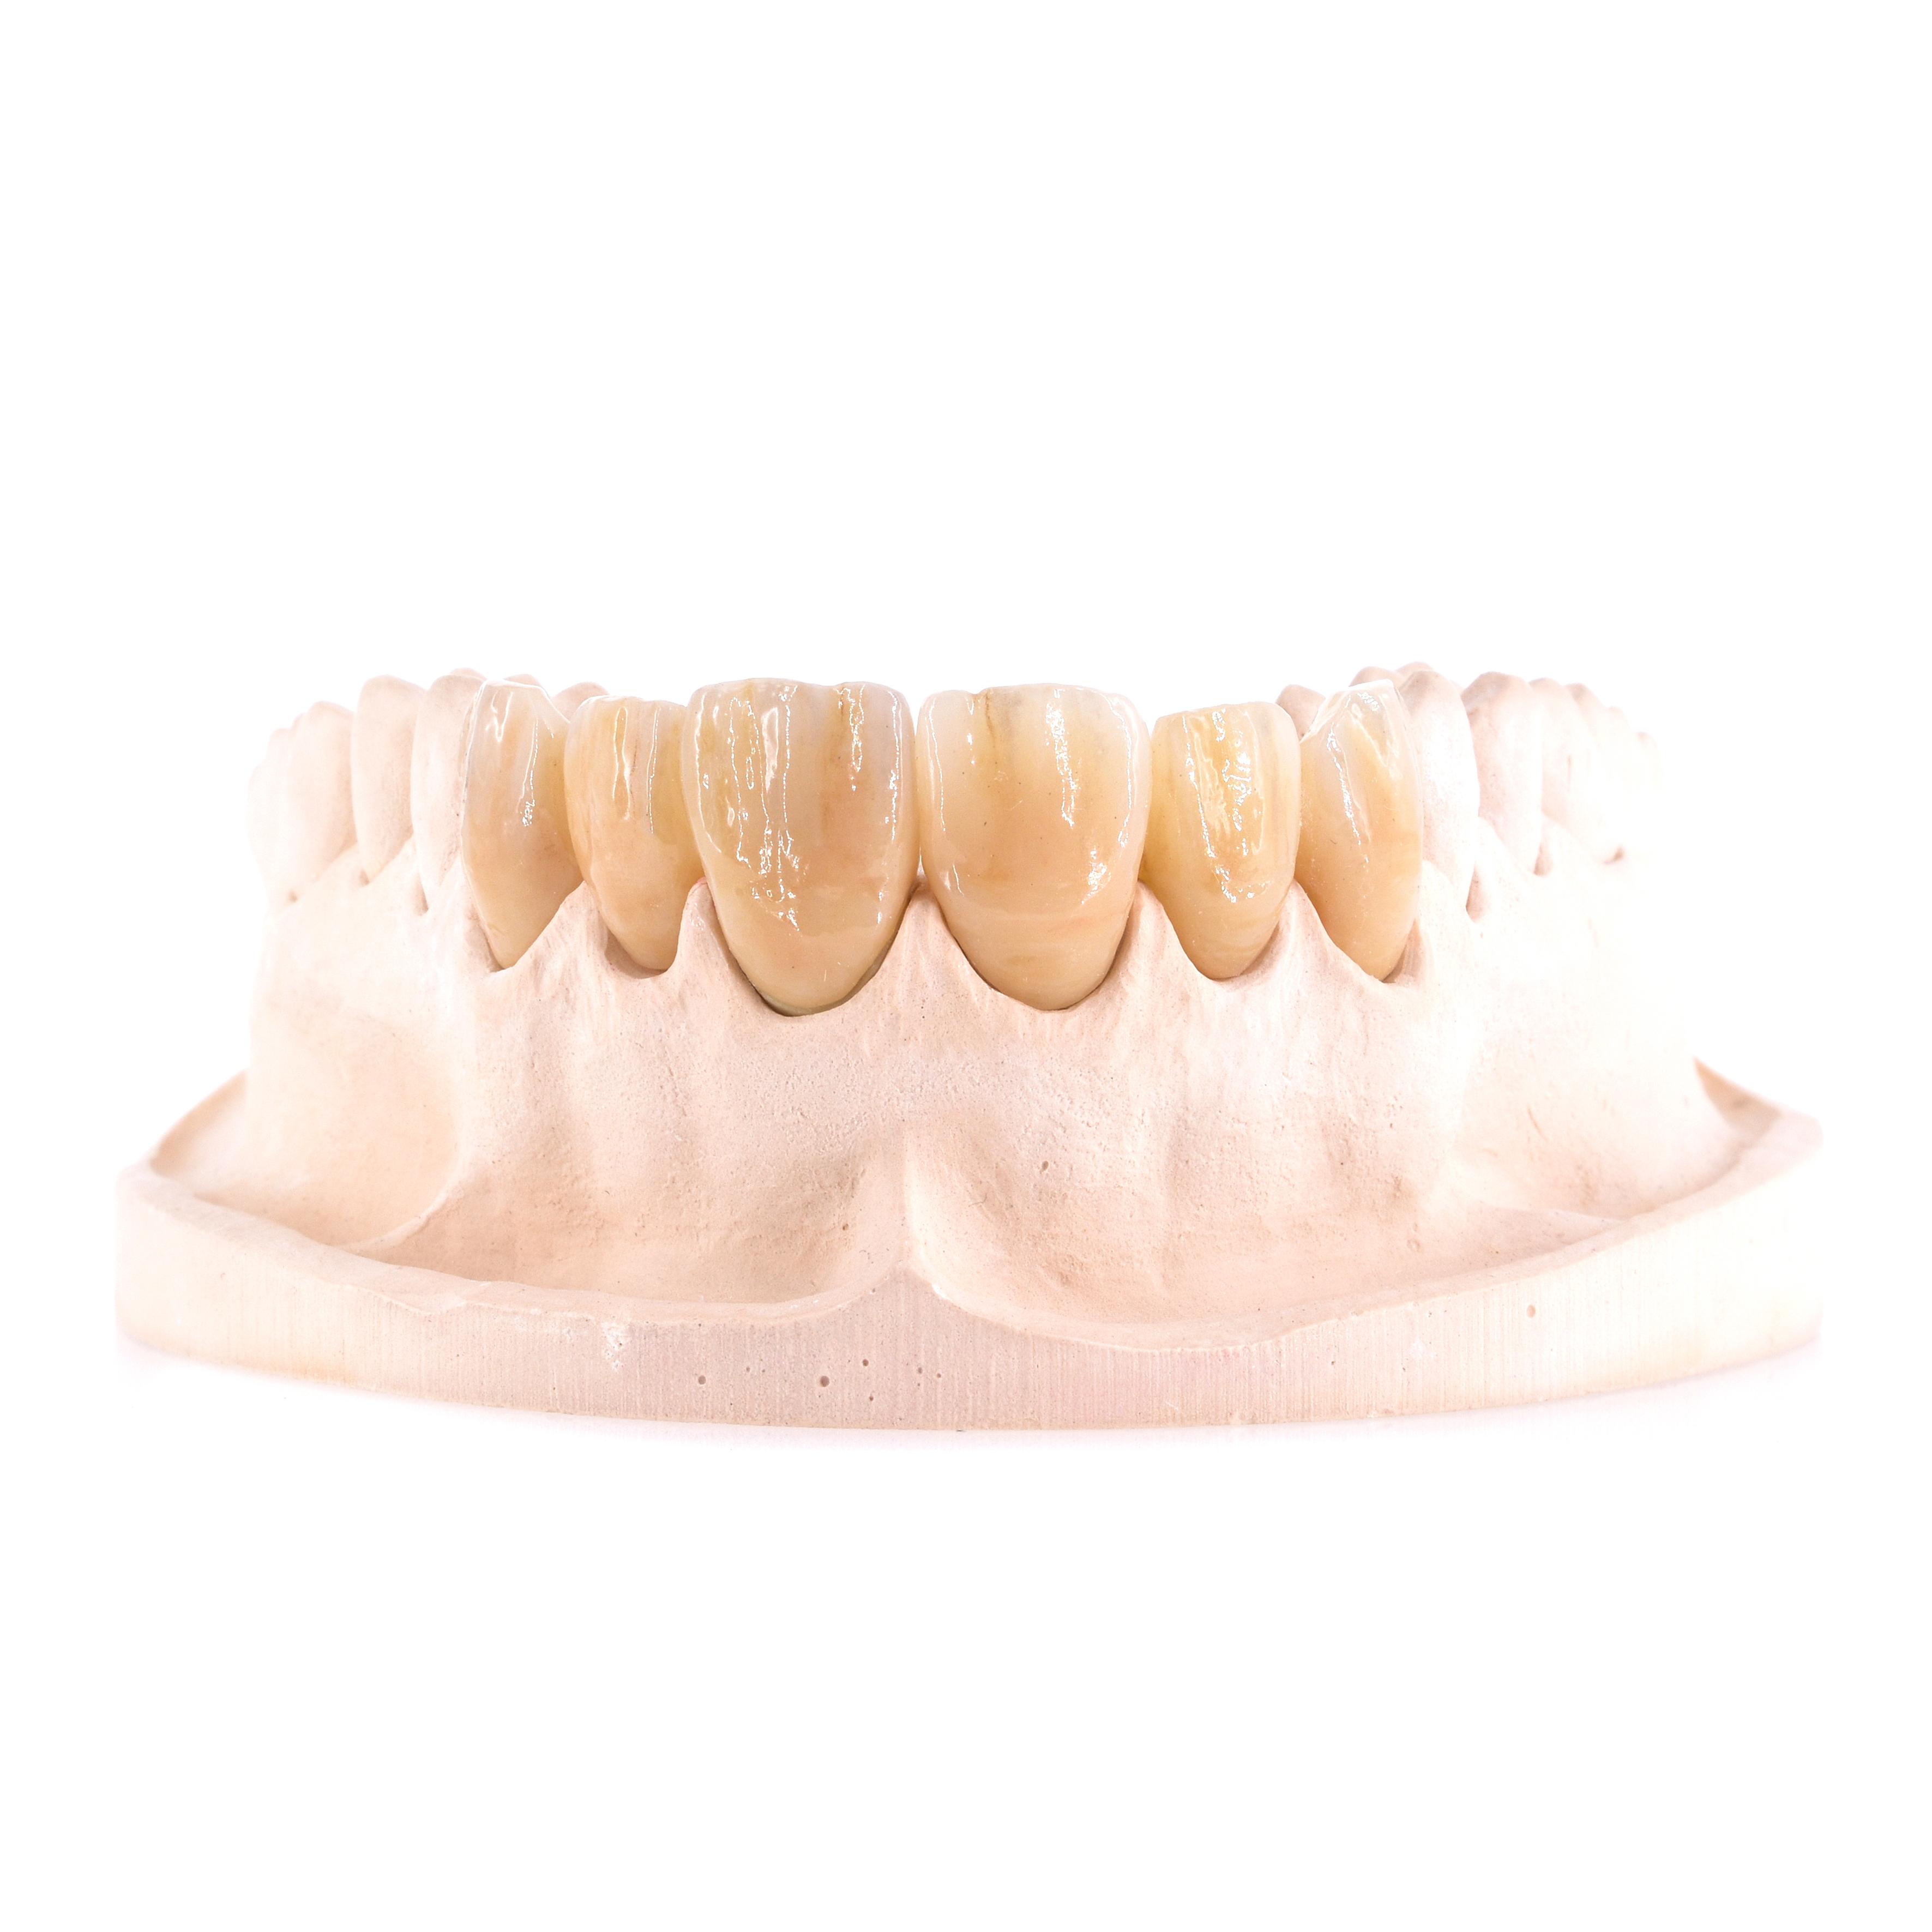 Zahnzentrum-Weiden-Herausnehmbarer-Zahnersatz